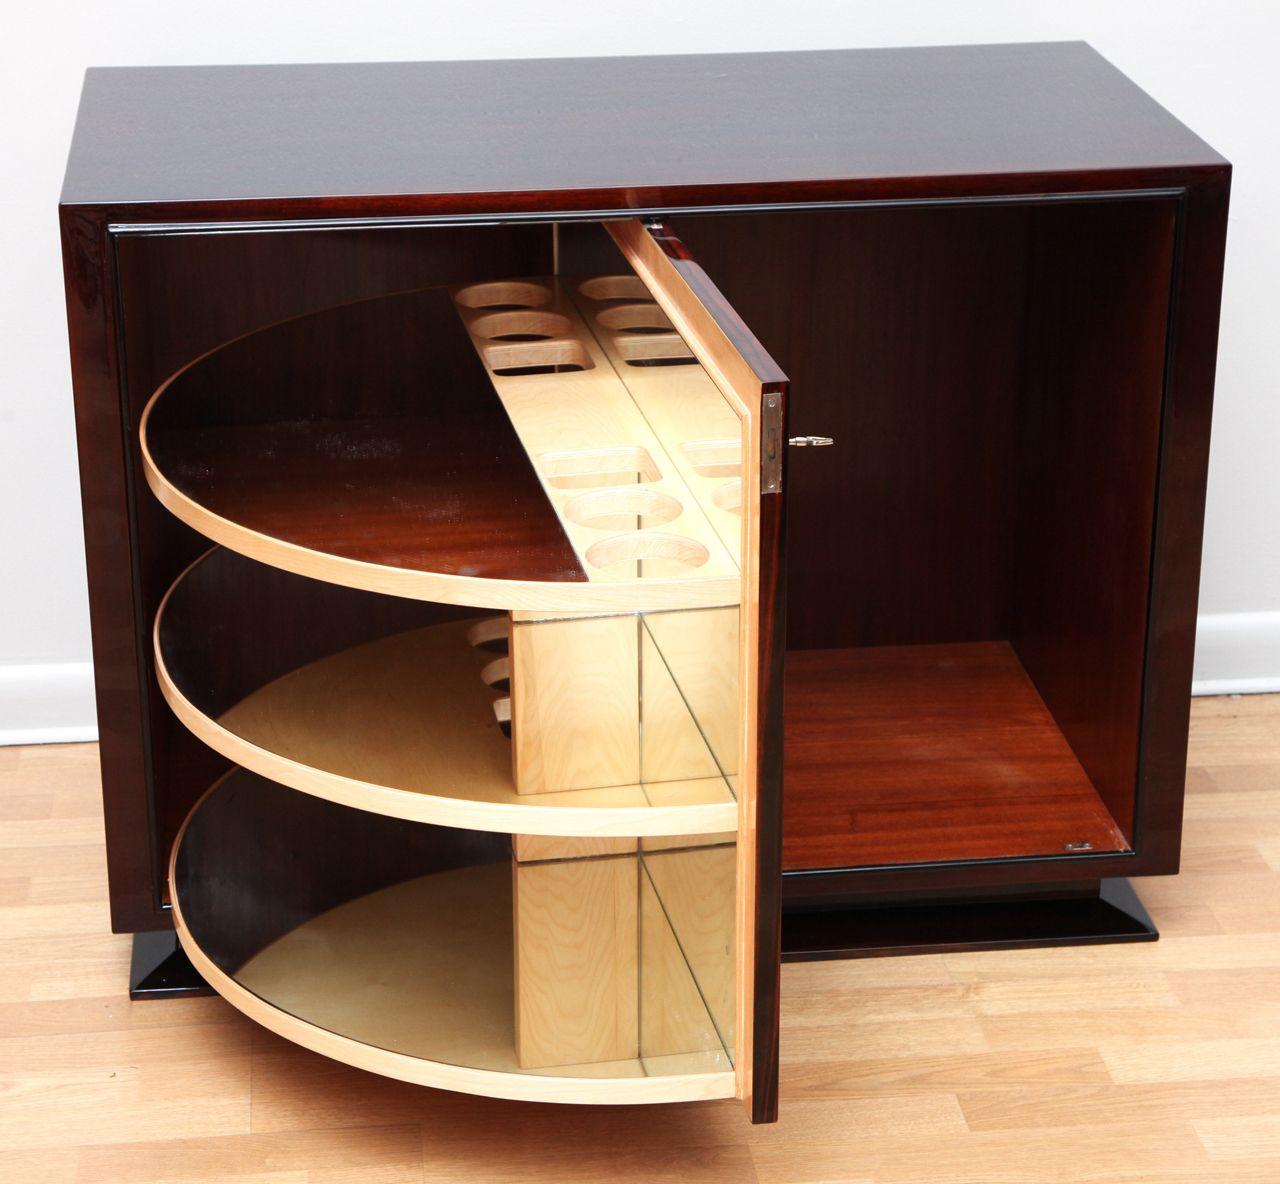 Cool Art Deco Kitchen Cabinets: Spectacular Art Deco Revolving Bar Cabinet